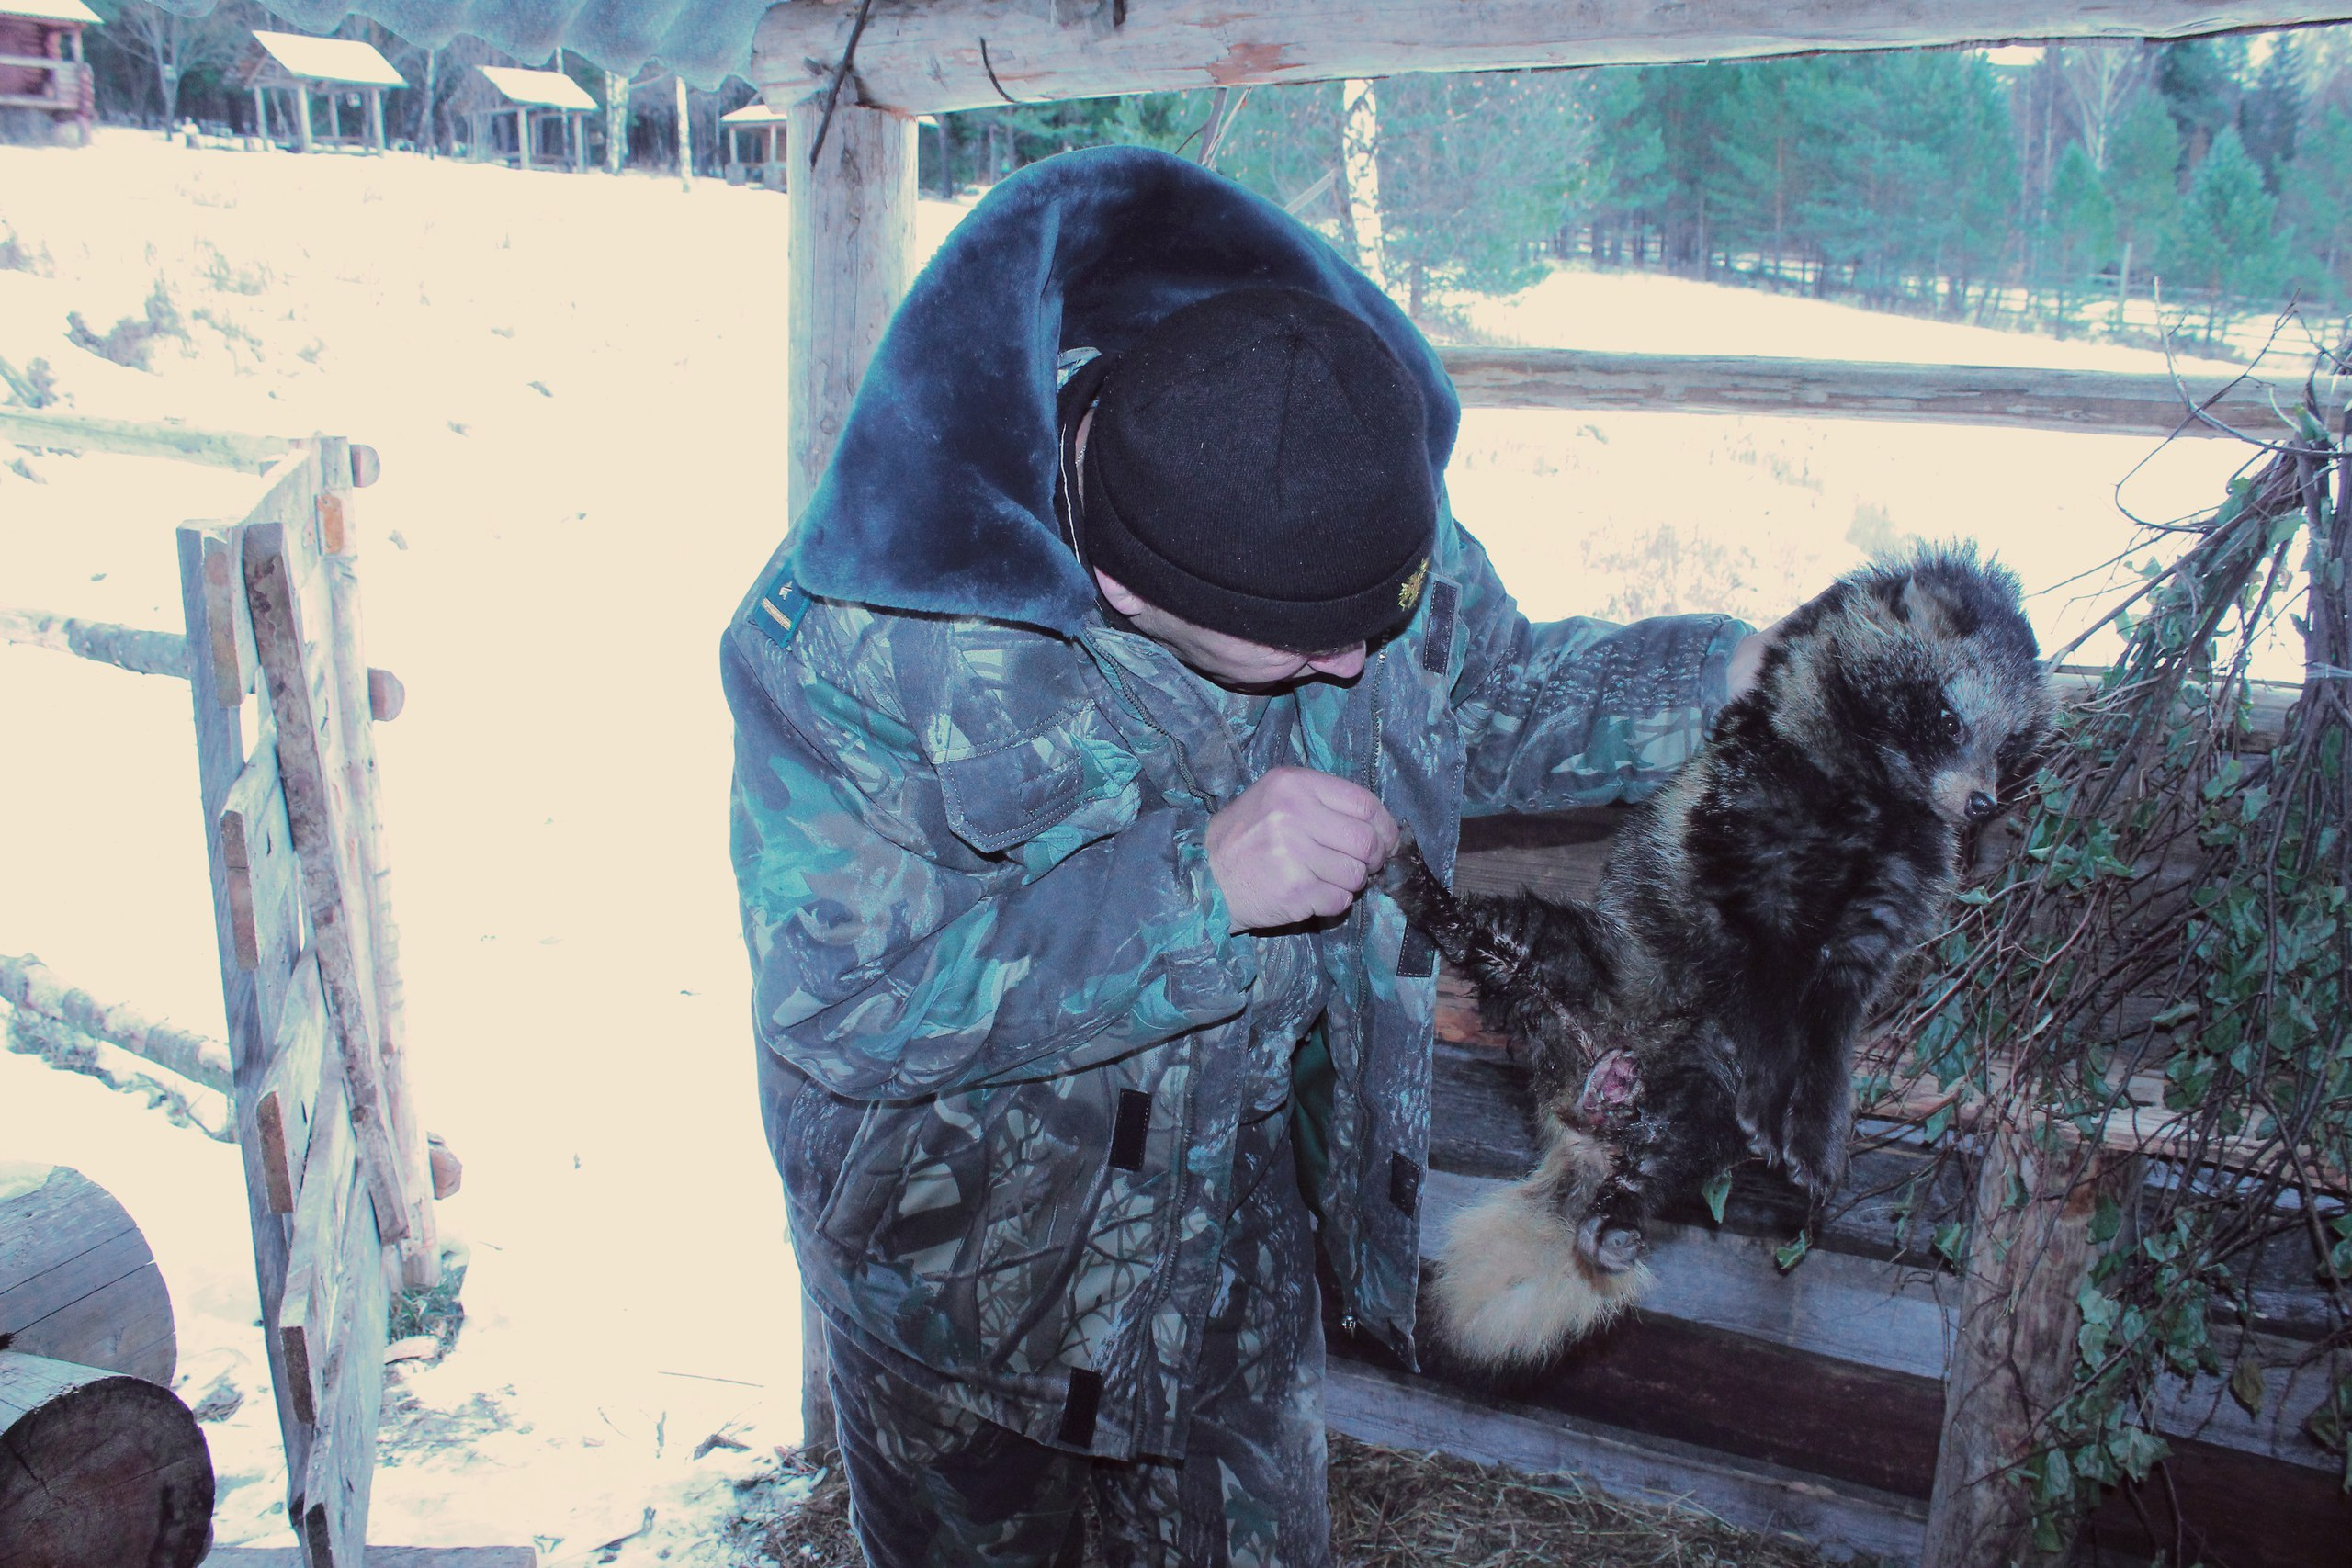 Умирающая отрака енотовидная собачка пришла ксотрудникамНП «Зюраткуль»